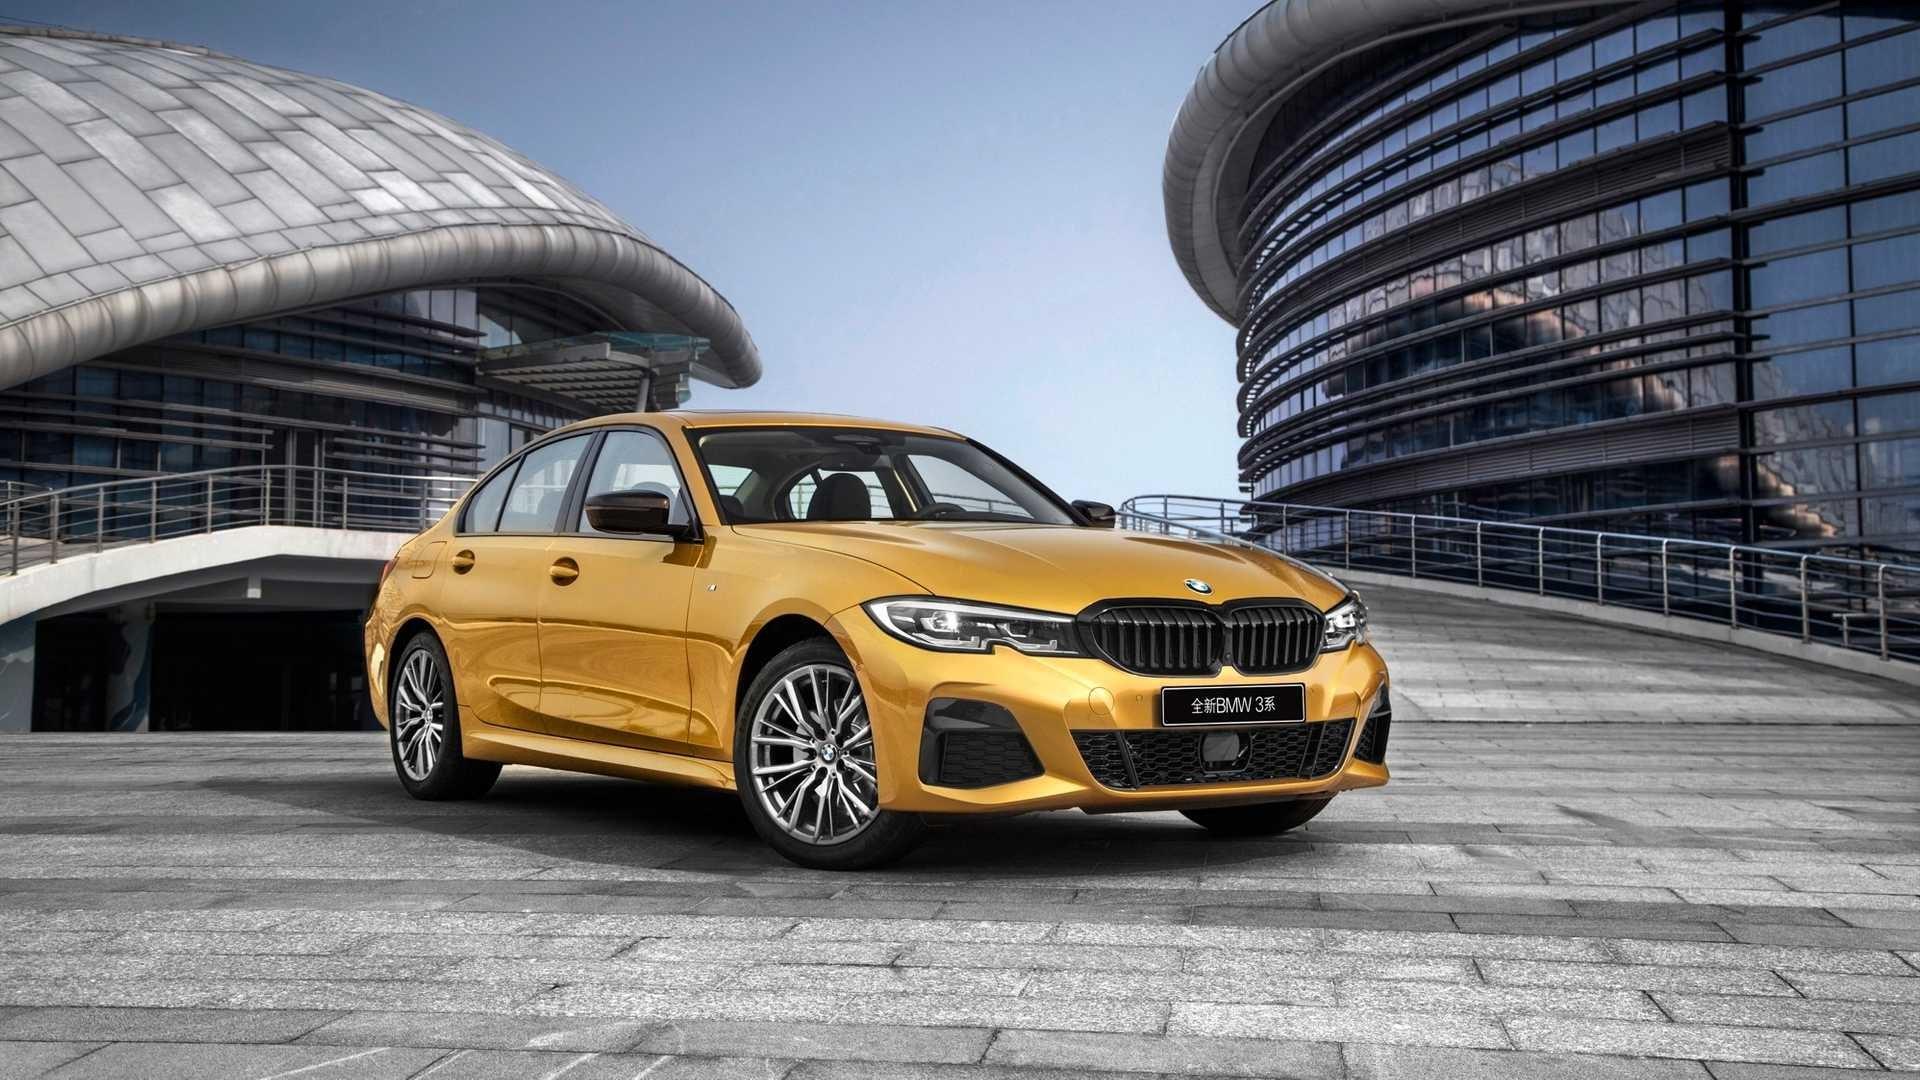 BMW-3-Series-LWB-Long-Wheelbase-2019-5